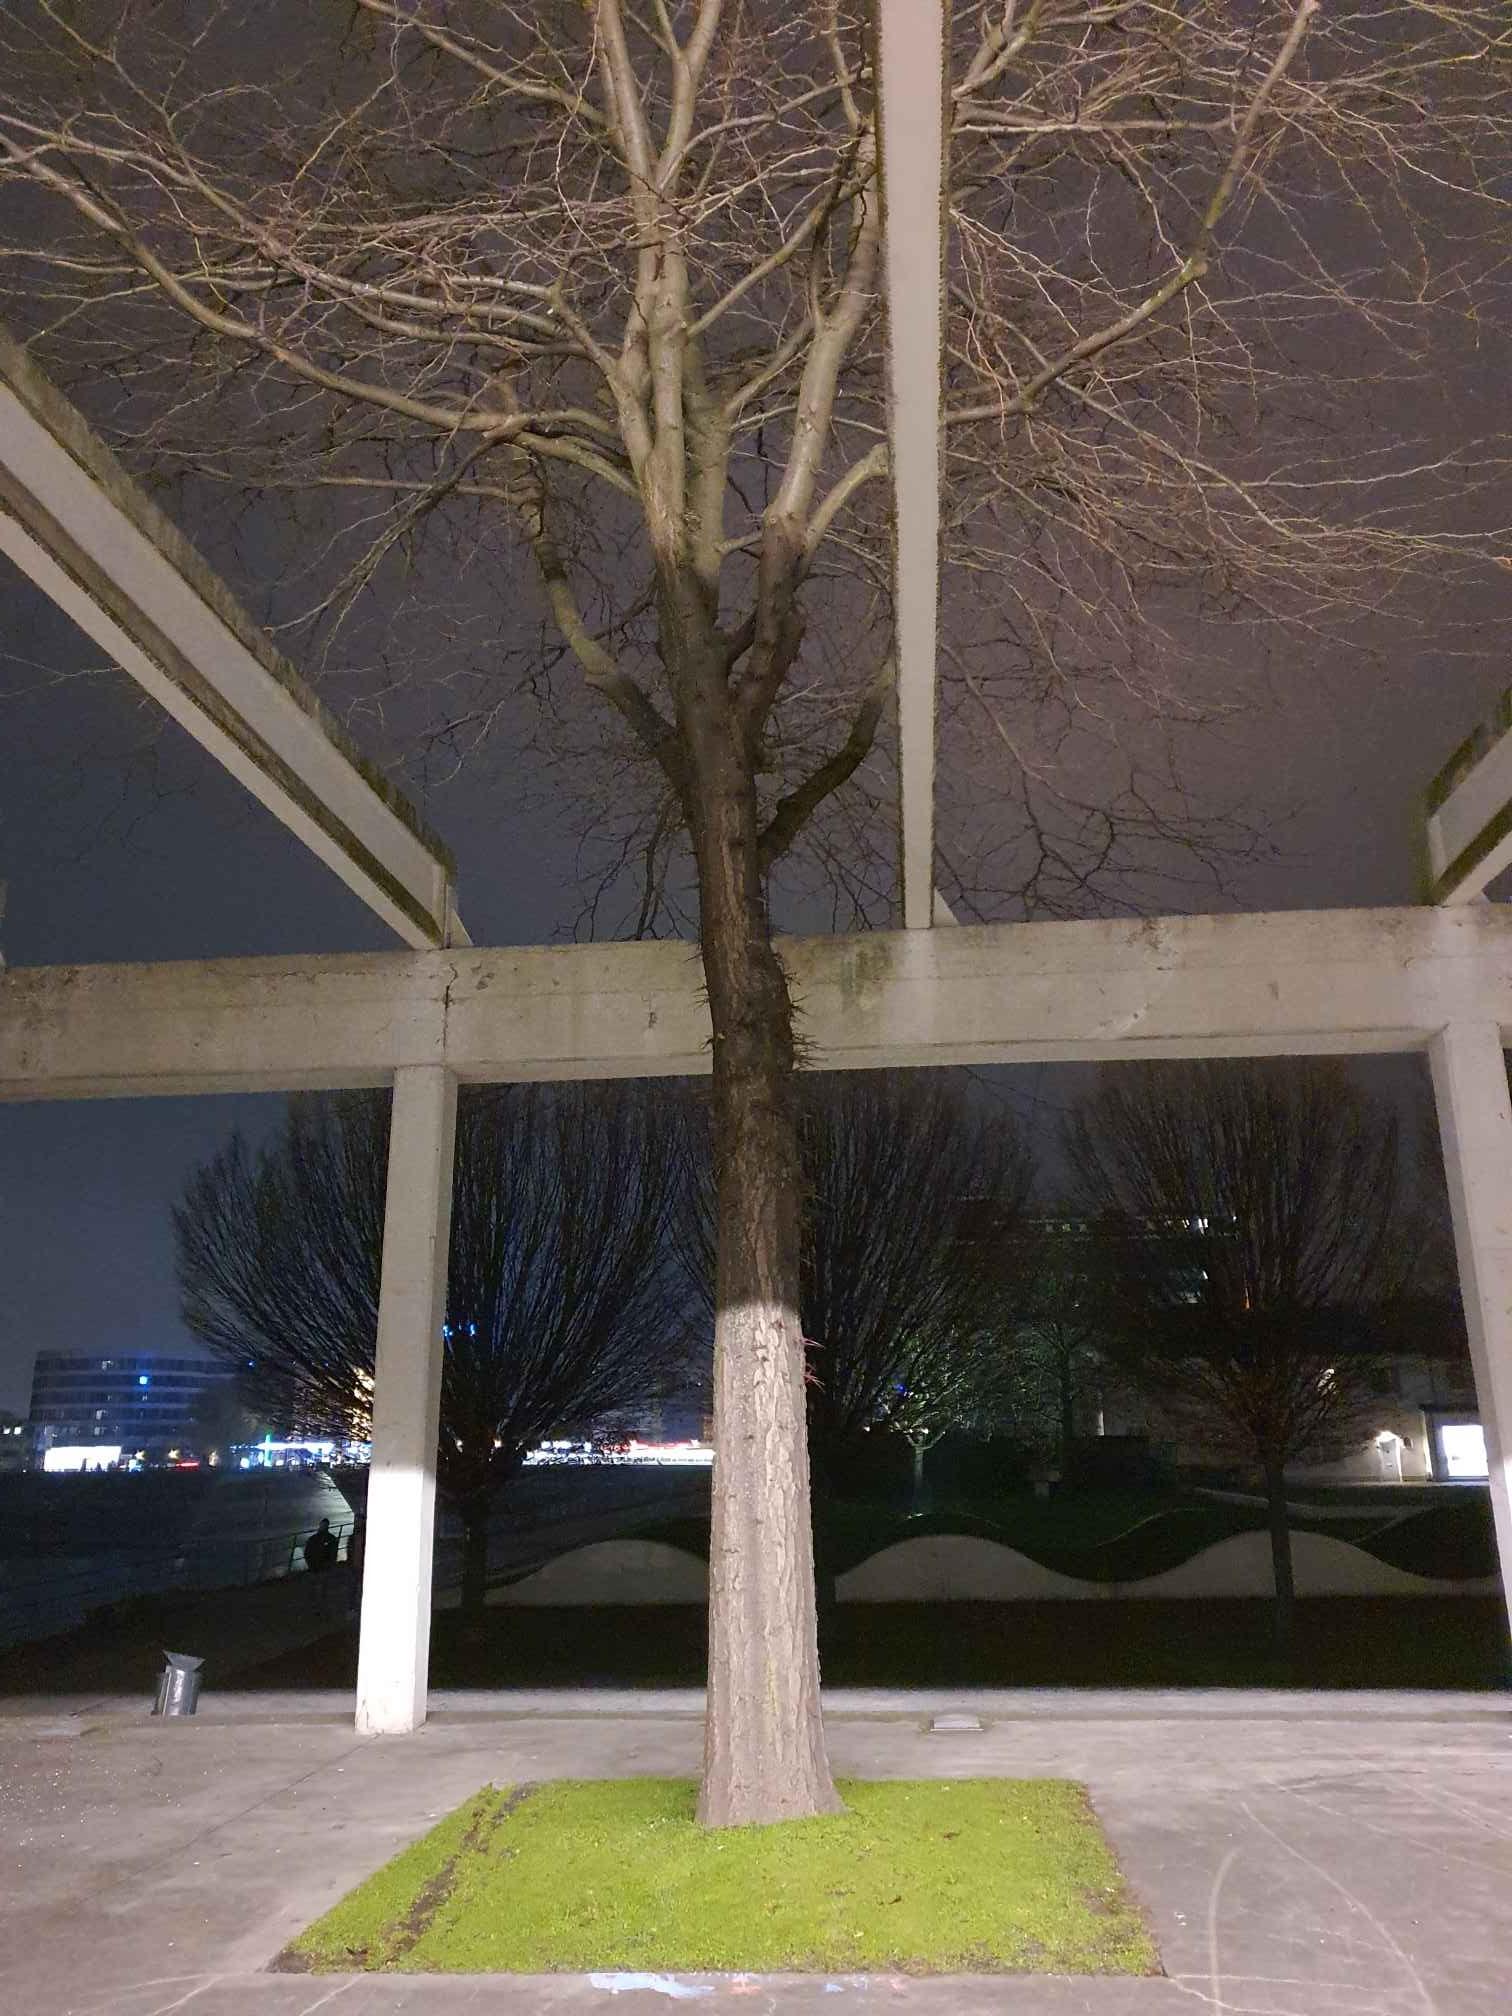 Durchs Dach